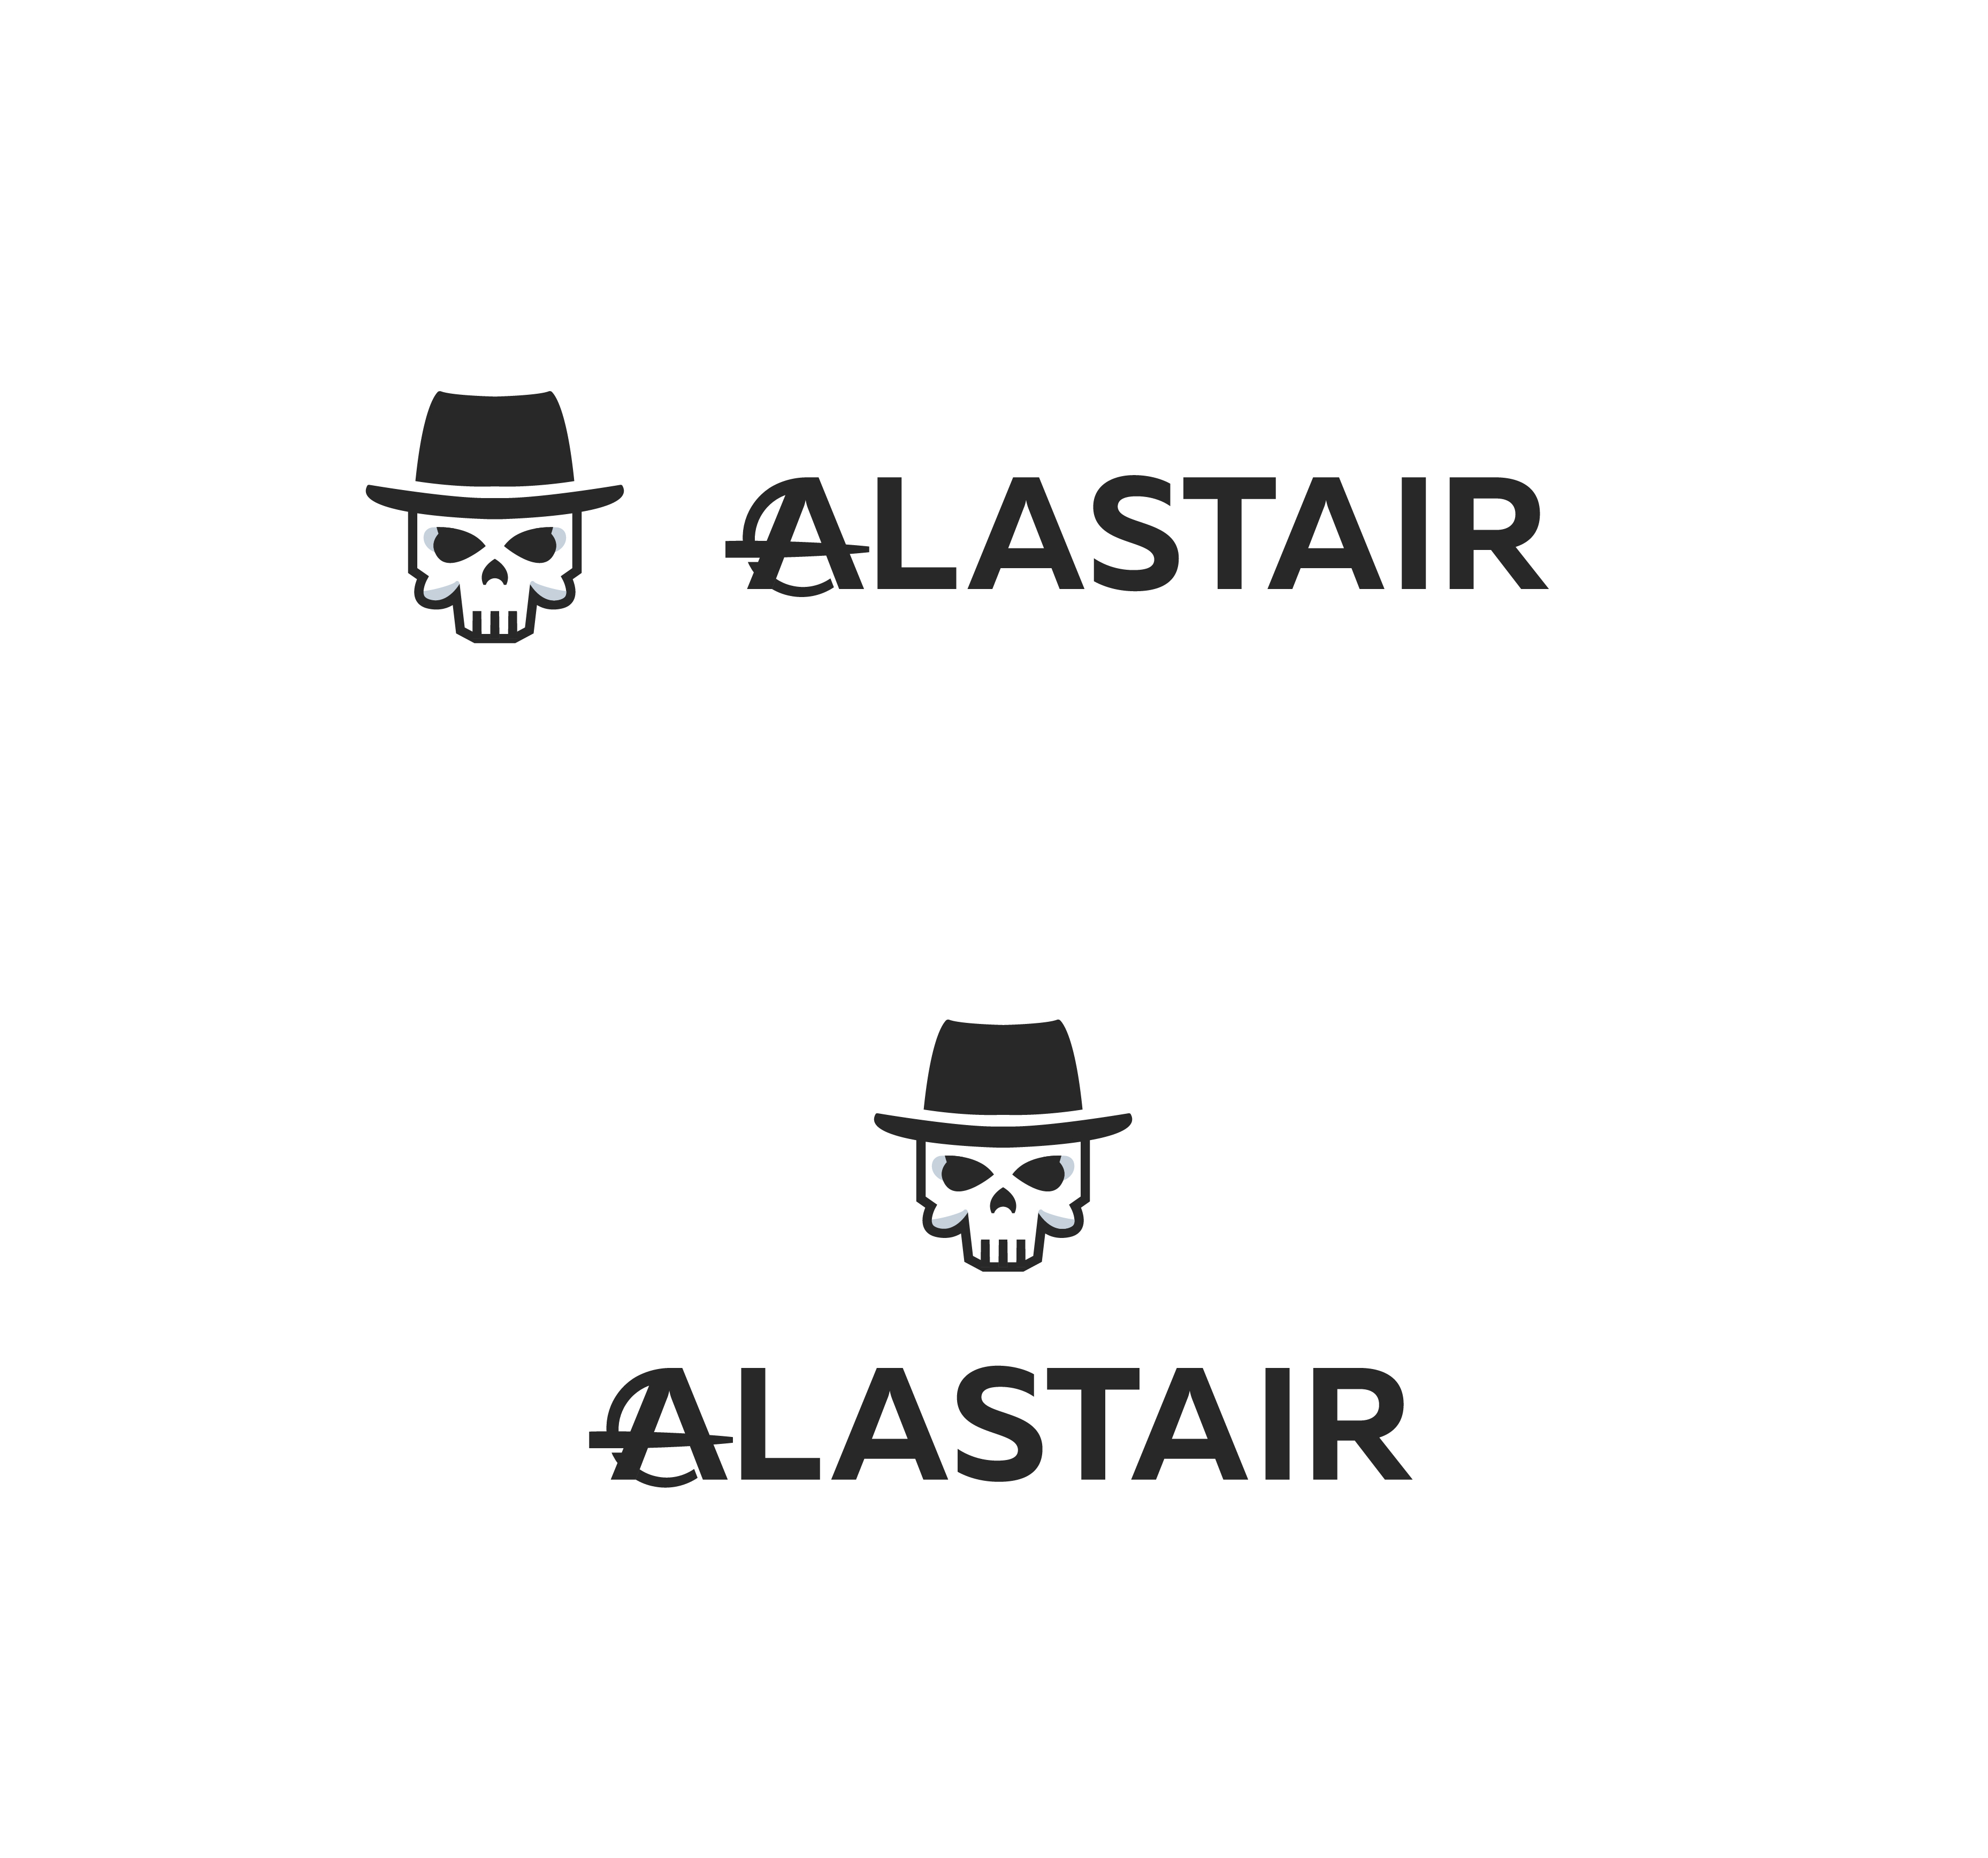 Фото Разработка дизайна логотипа для интернет-магазина рок-атрибутики «Alastair» Вариант 8